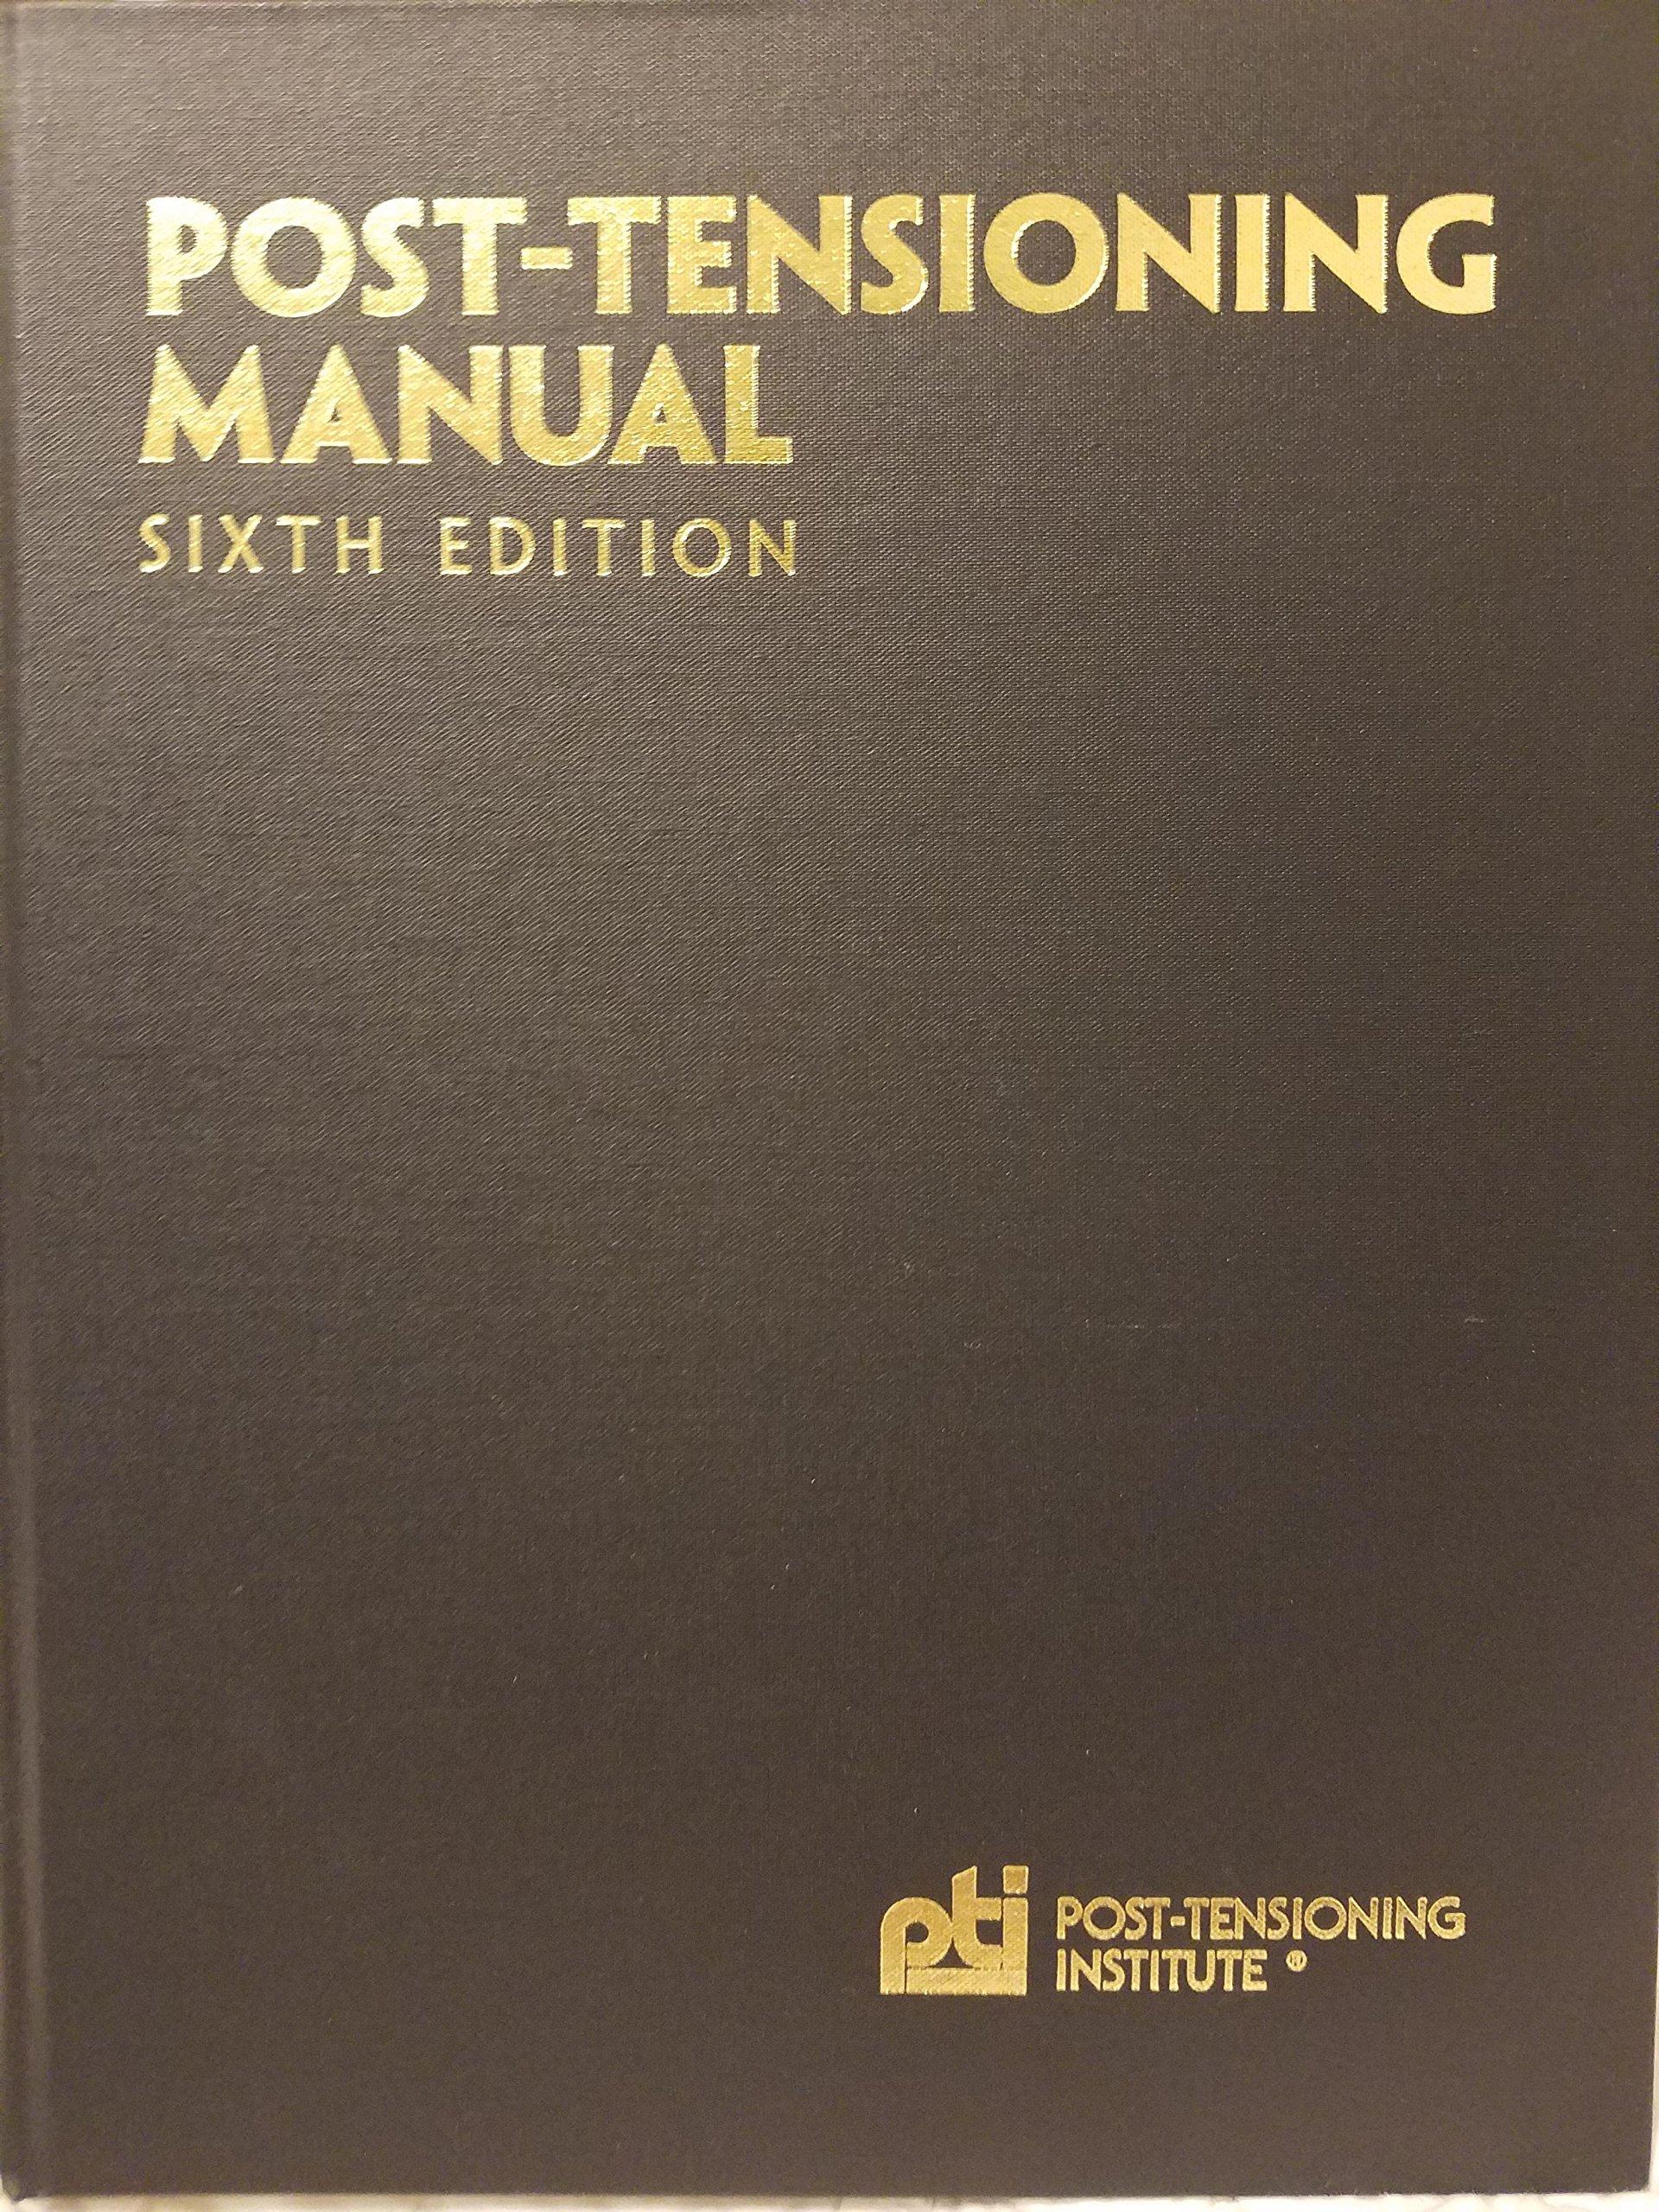 Post-Tensioning Manual: Post Tensioning Institute: 9780977875207:  Amazon.com: Books